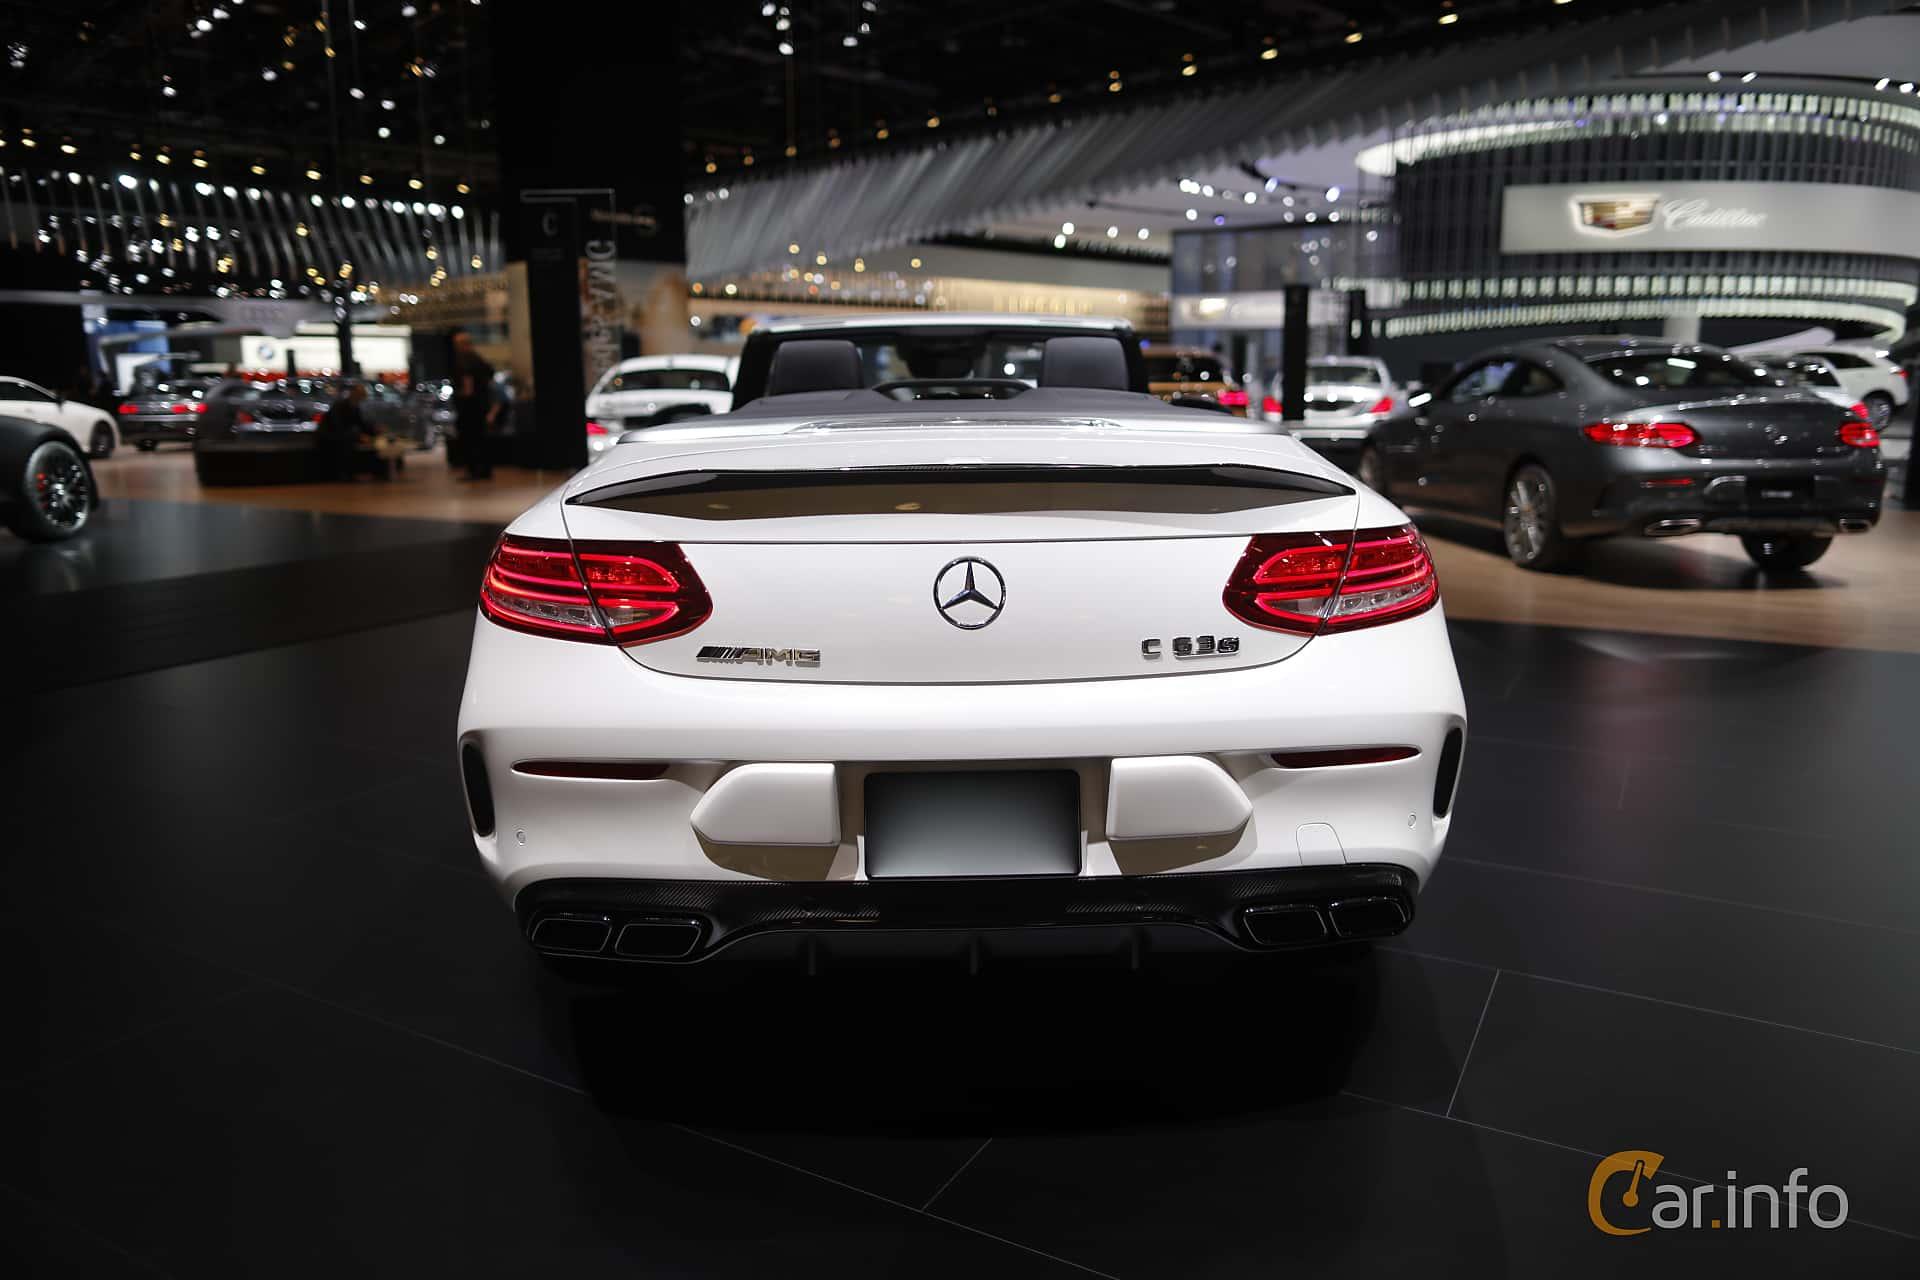 Mercedes-Benz AMG C 63 S Cabriolet 4.0 V8 AMG Speedshift MCT, 510hk, 2017 at North American International Auto Show 2017